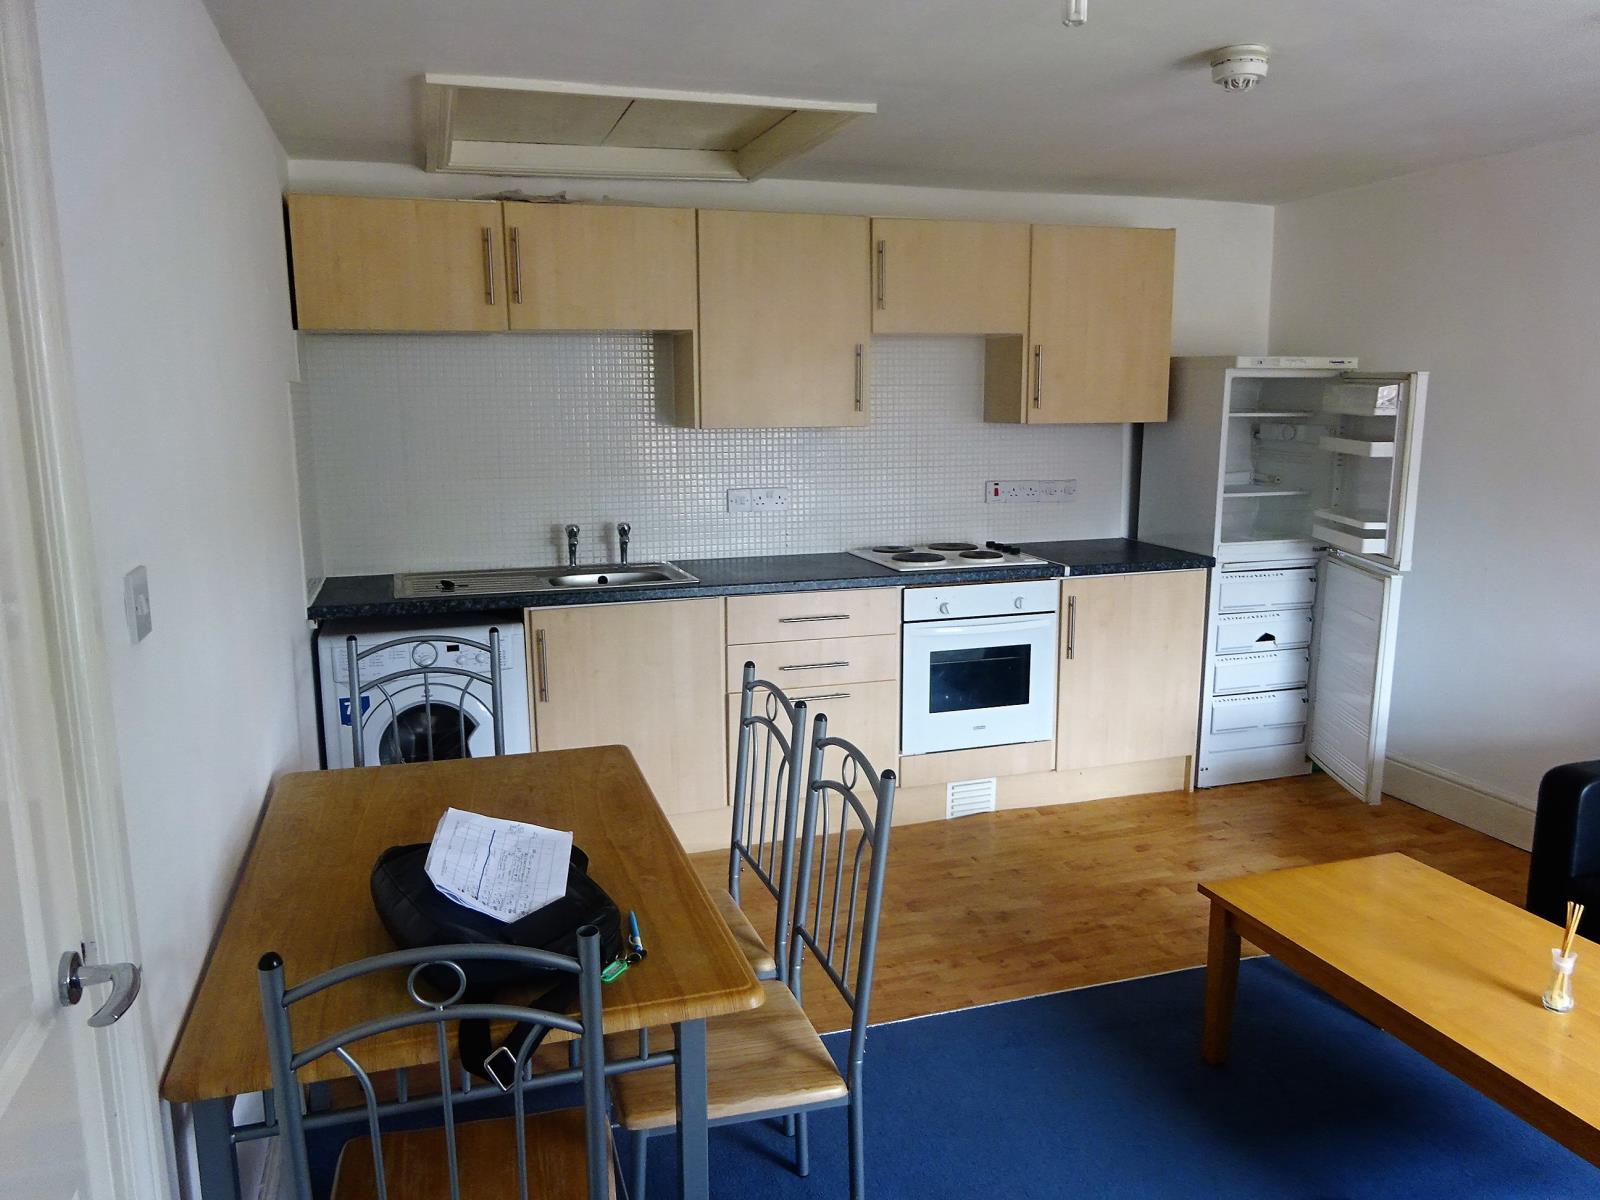 1 Bedroom Flat Let in Manchester, M13